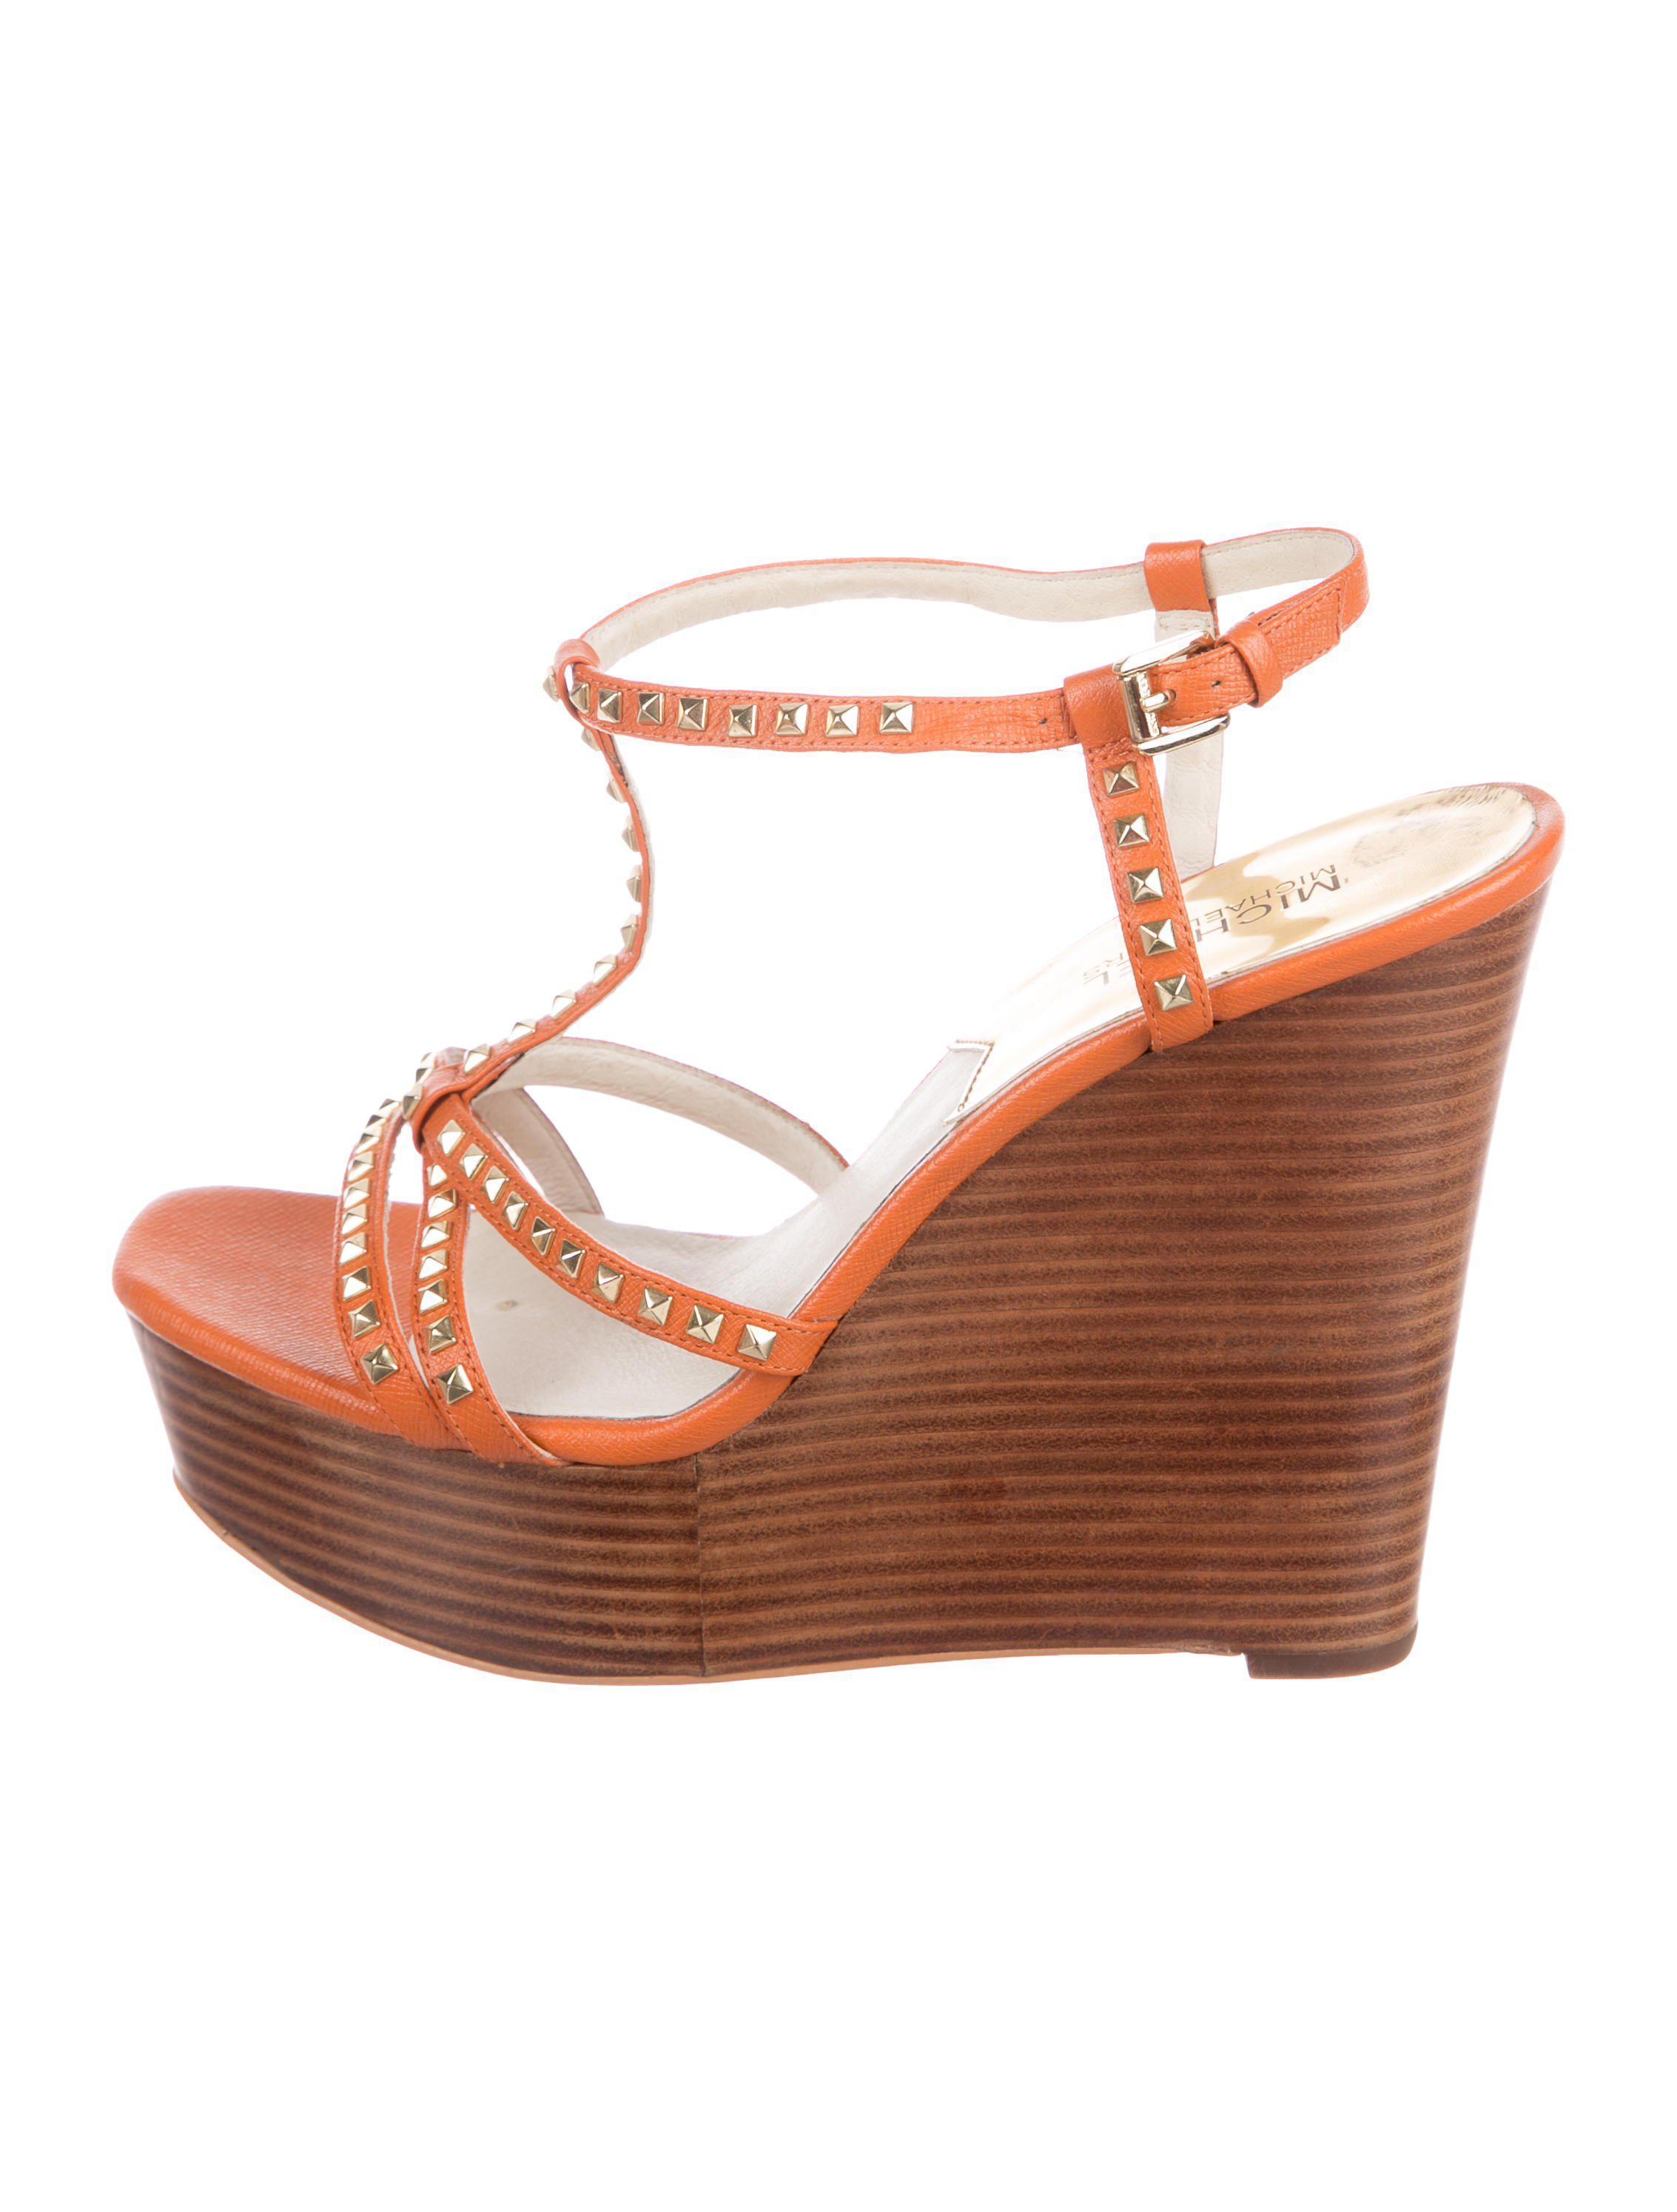 778bd2e99361 MICHAEL Michael Kors. Women s Metallic Michael Kors Leather Studded Wedges  Orange